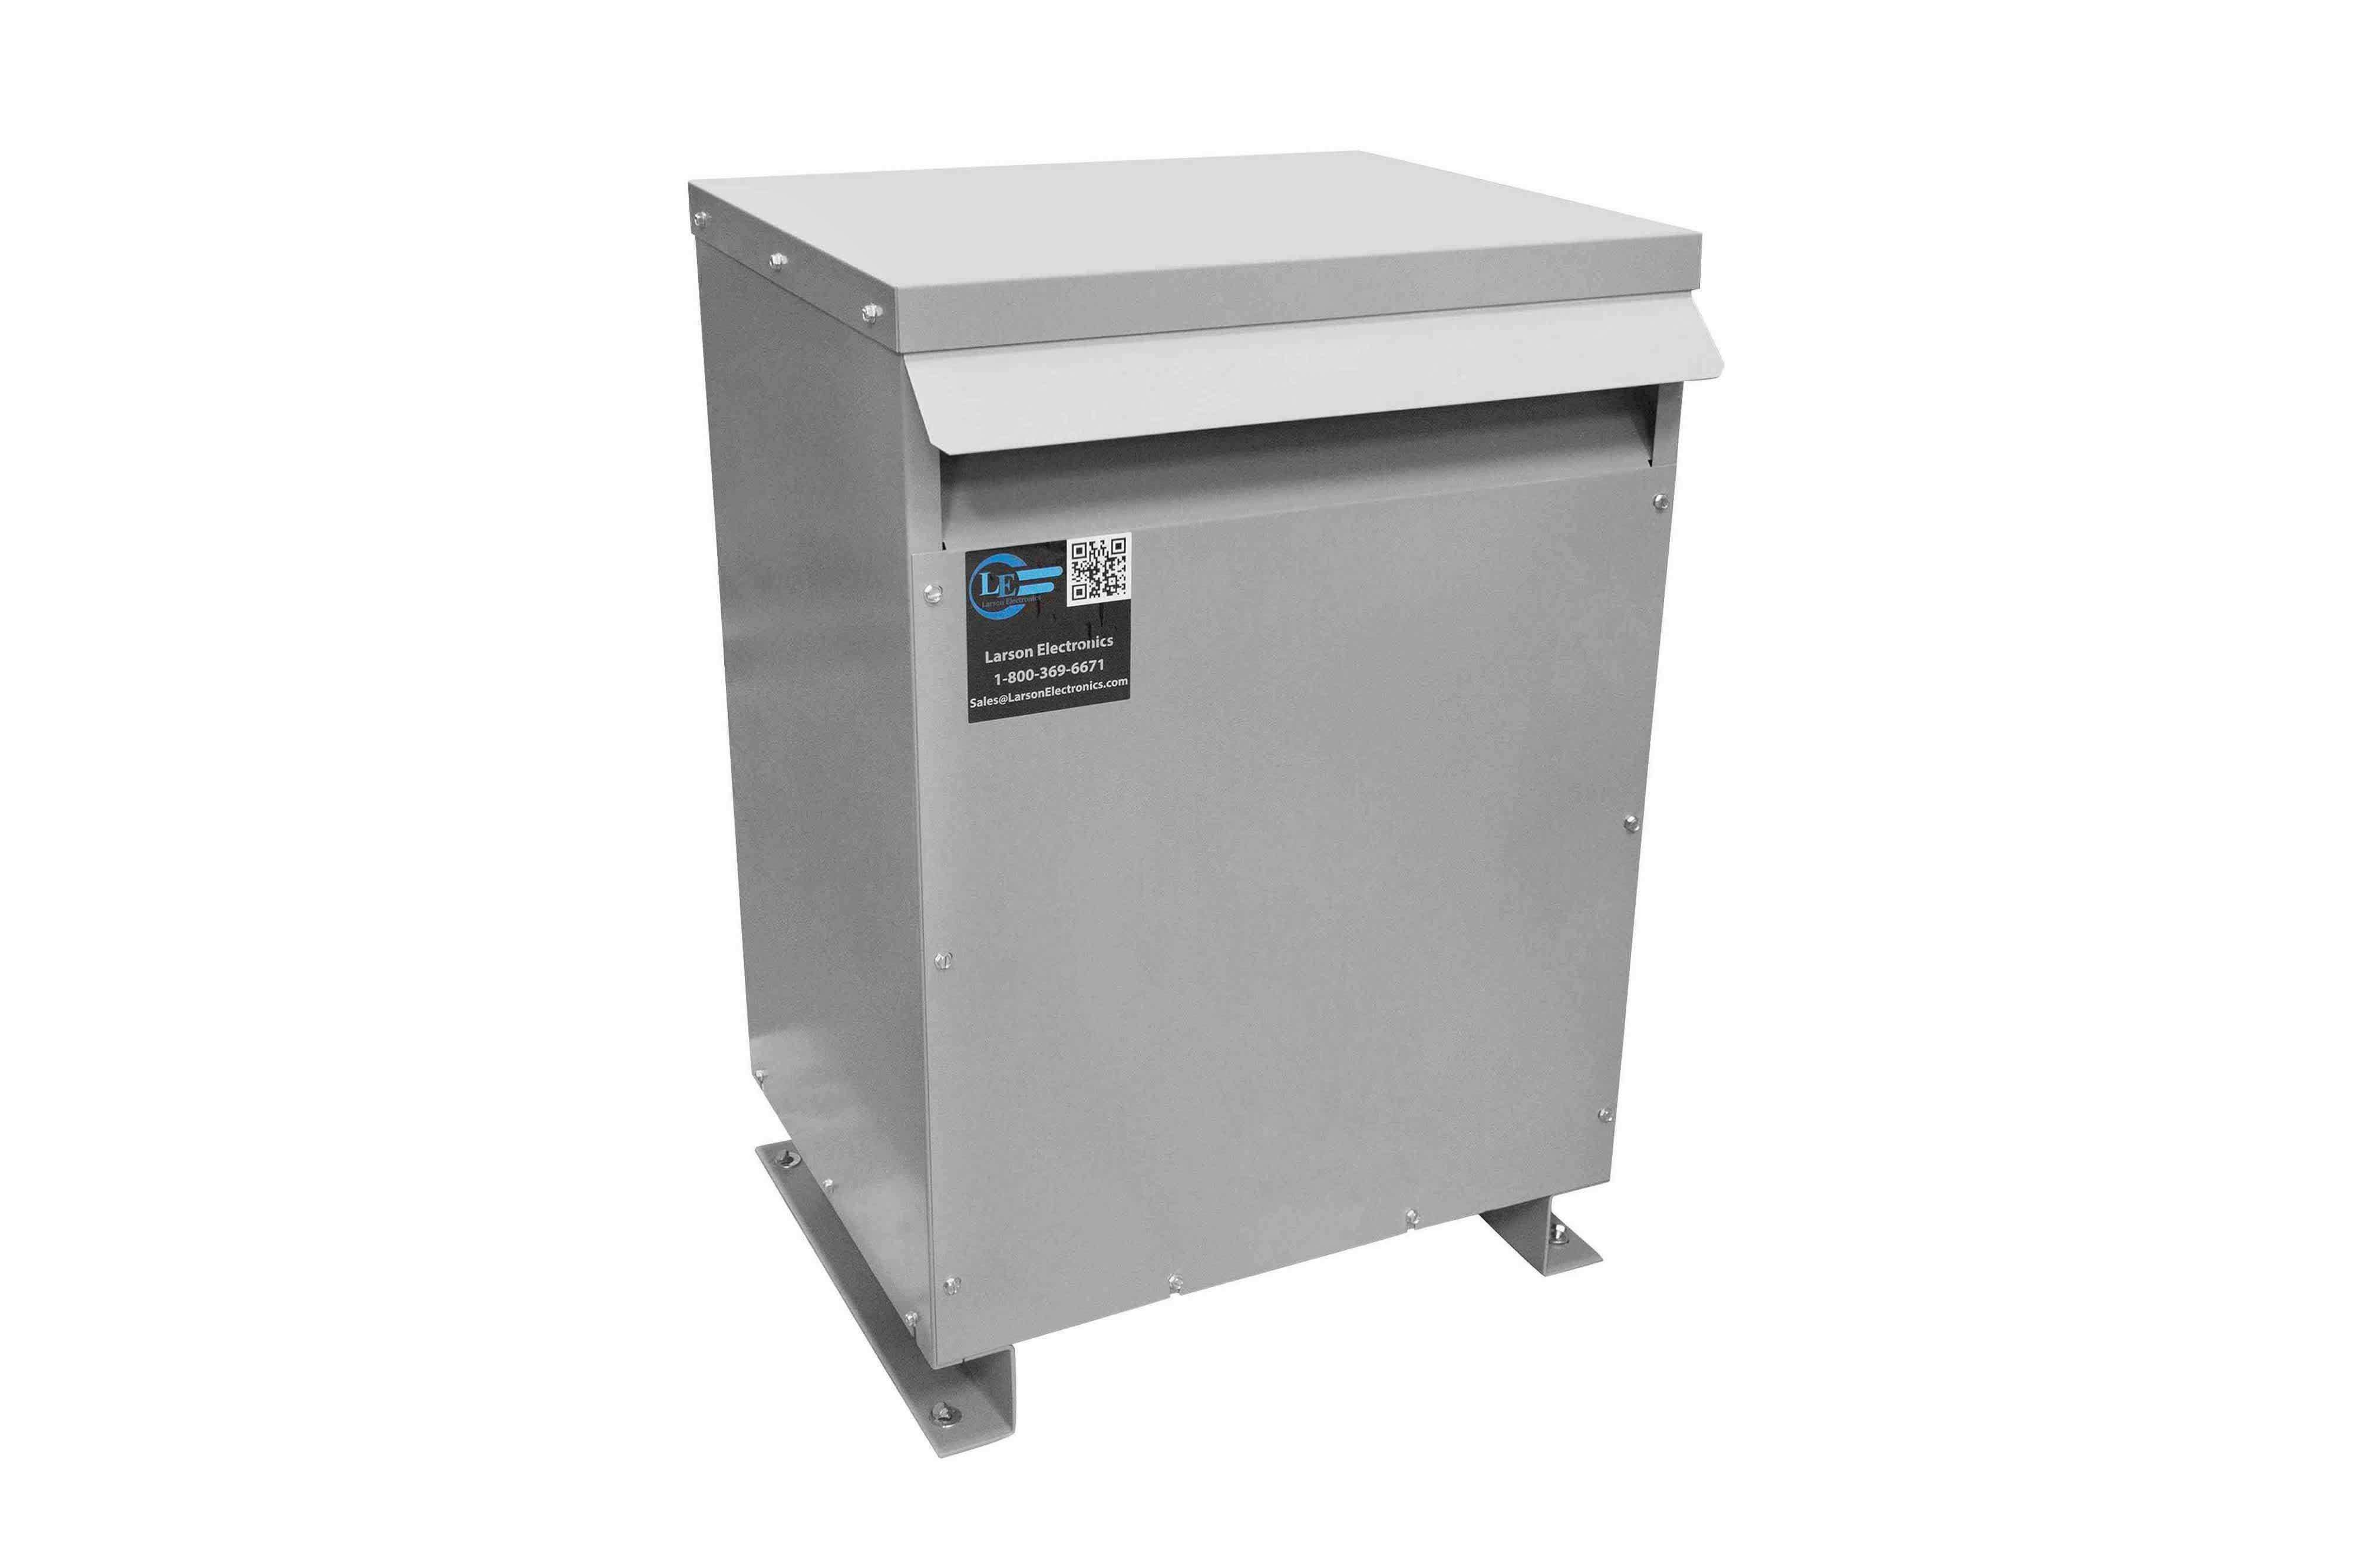 9 kVA 3PH Isolation Transformer, 600V Wye Primary, 208Y/120 Wye-N Secondary, N3R, Ventilated, 60 Hz